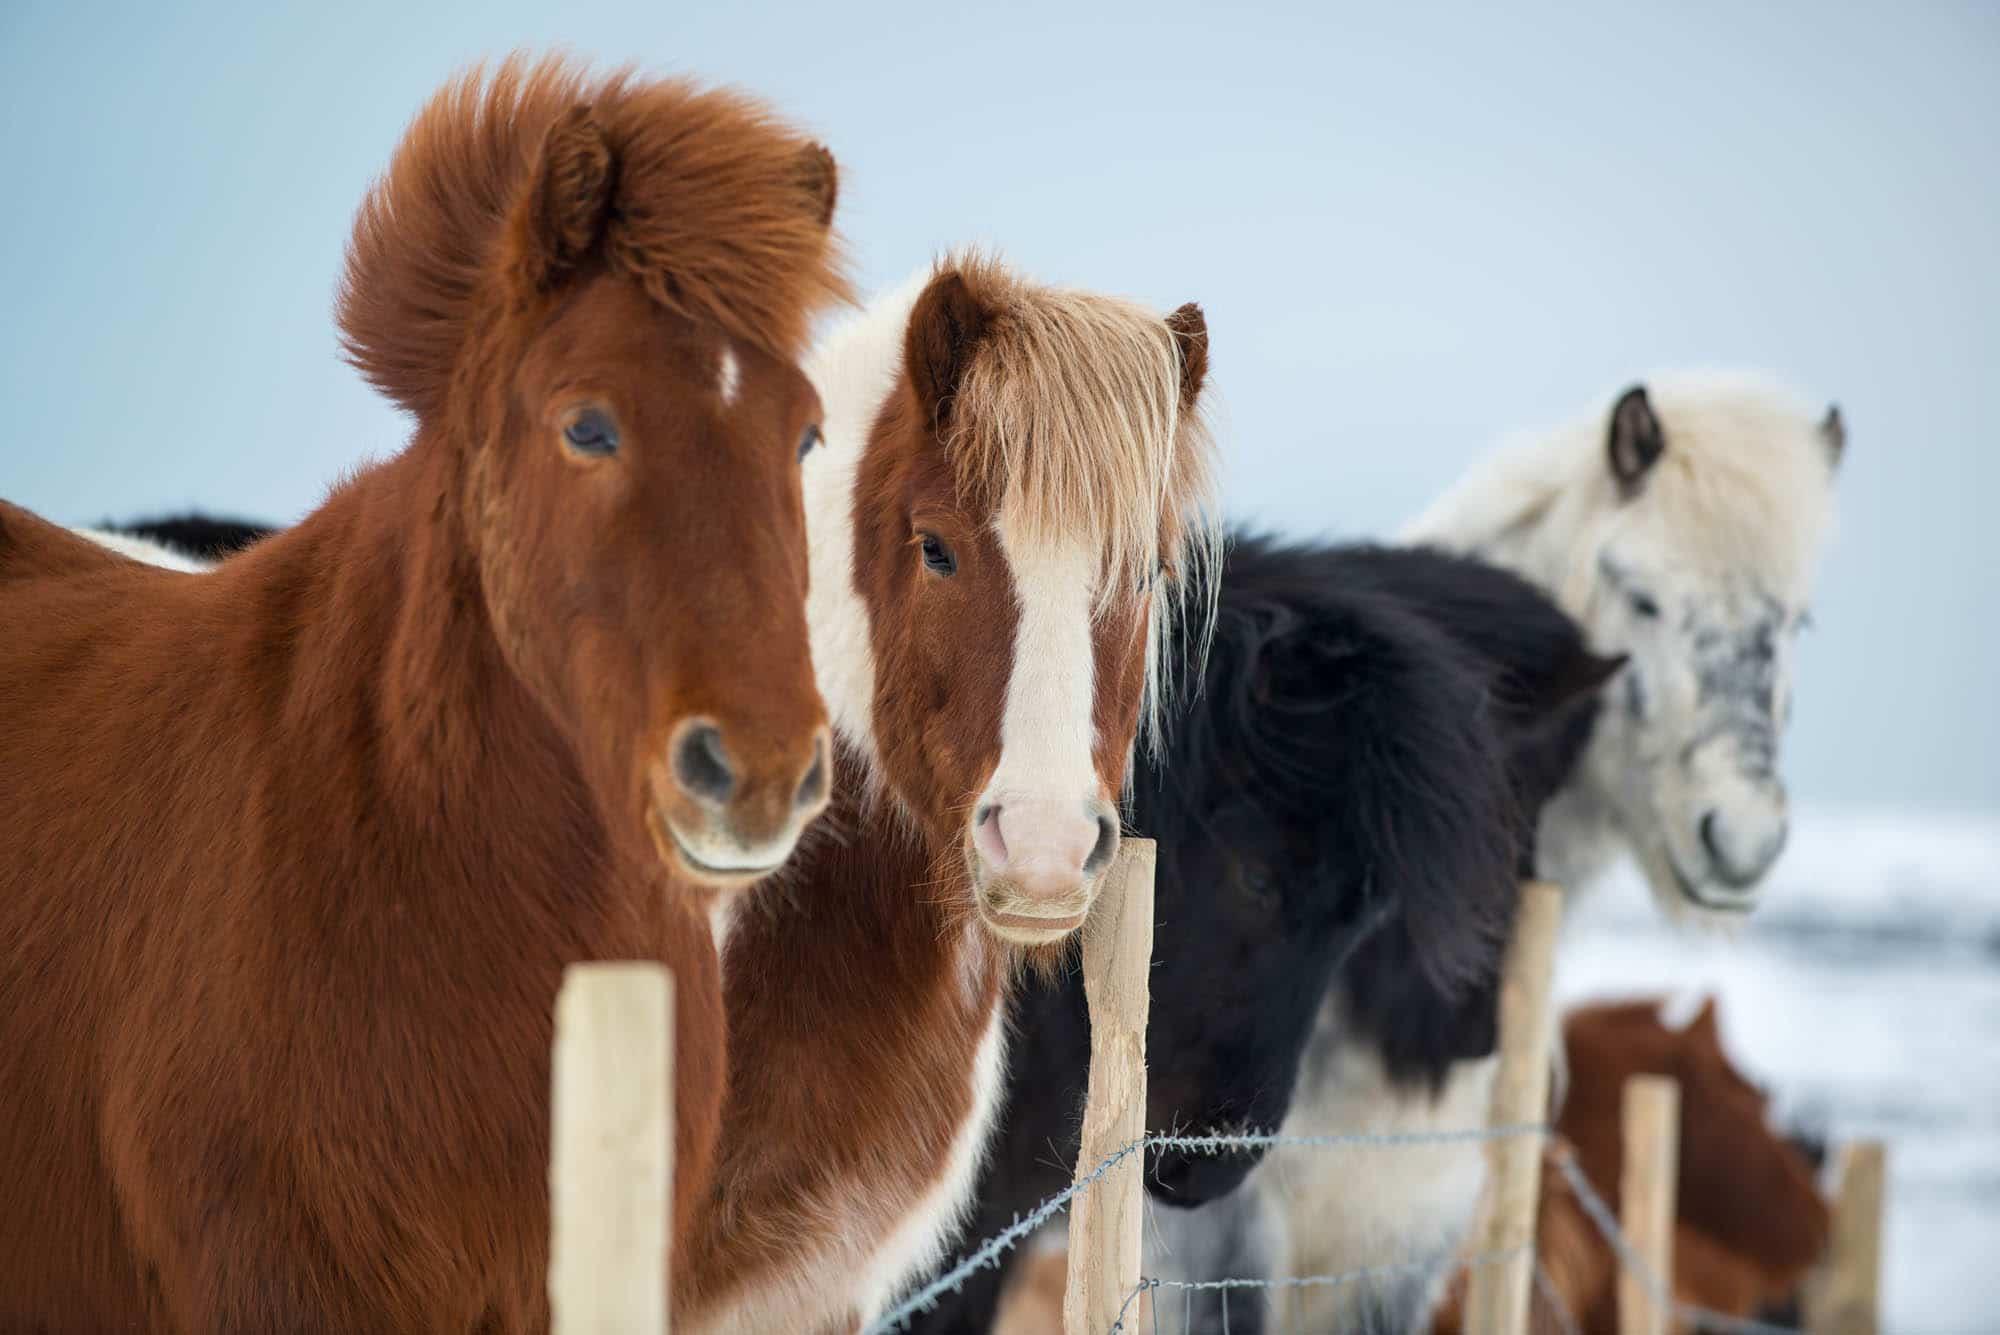 4 Icelandic horses in winter starring into camera